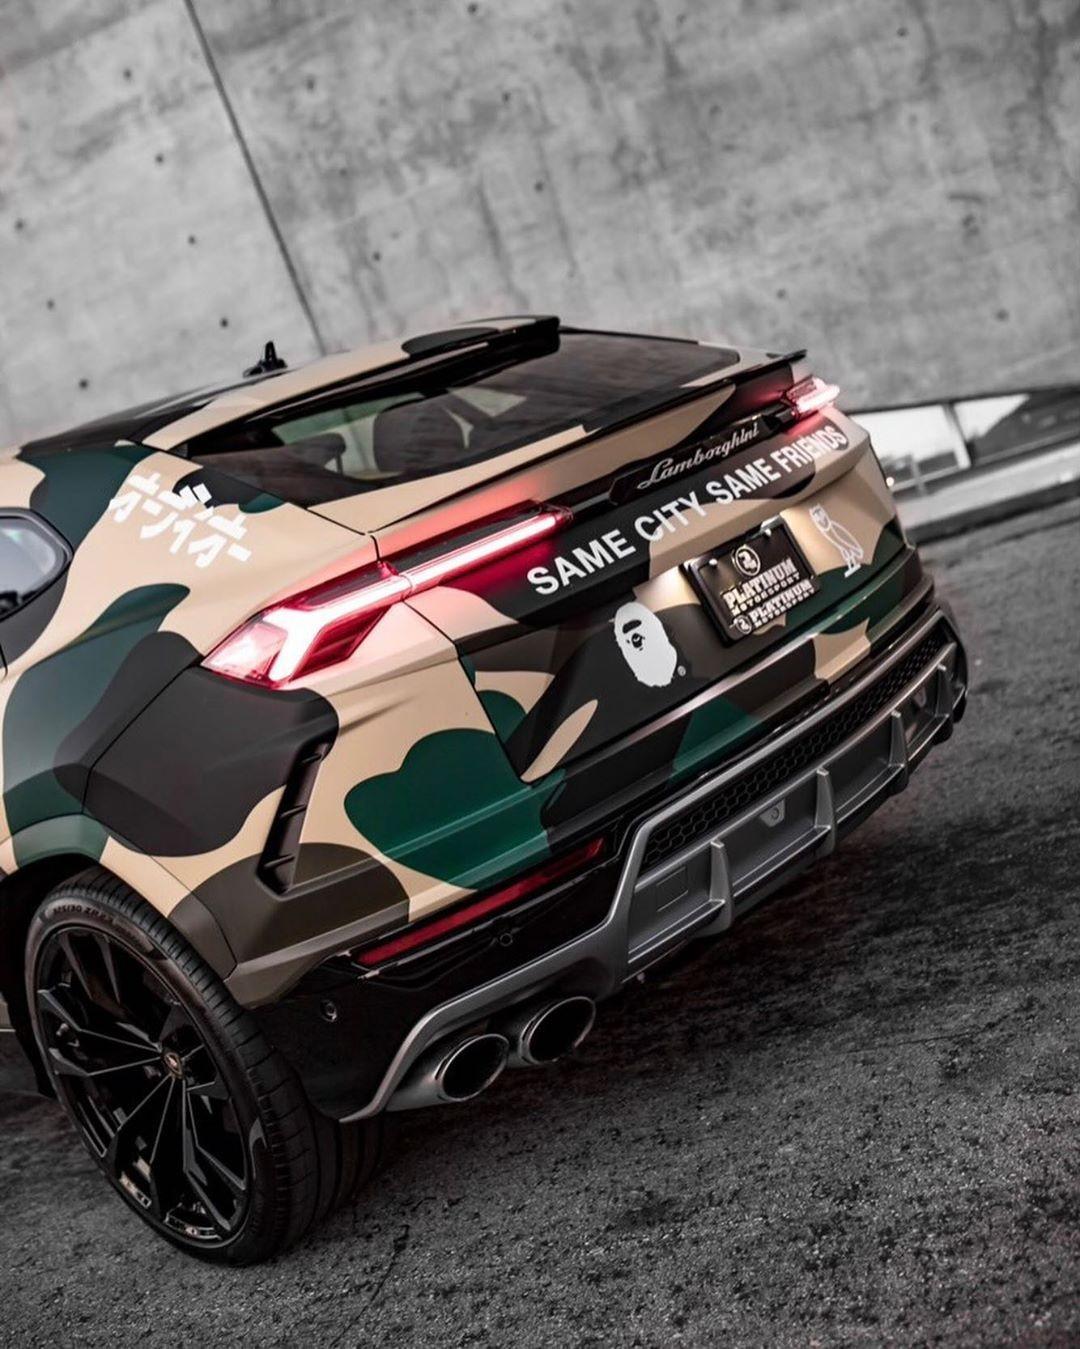 BAPE x OVO Porsche Urus